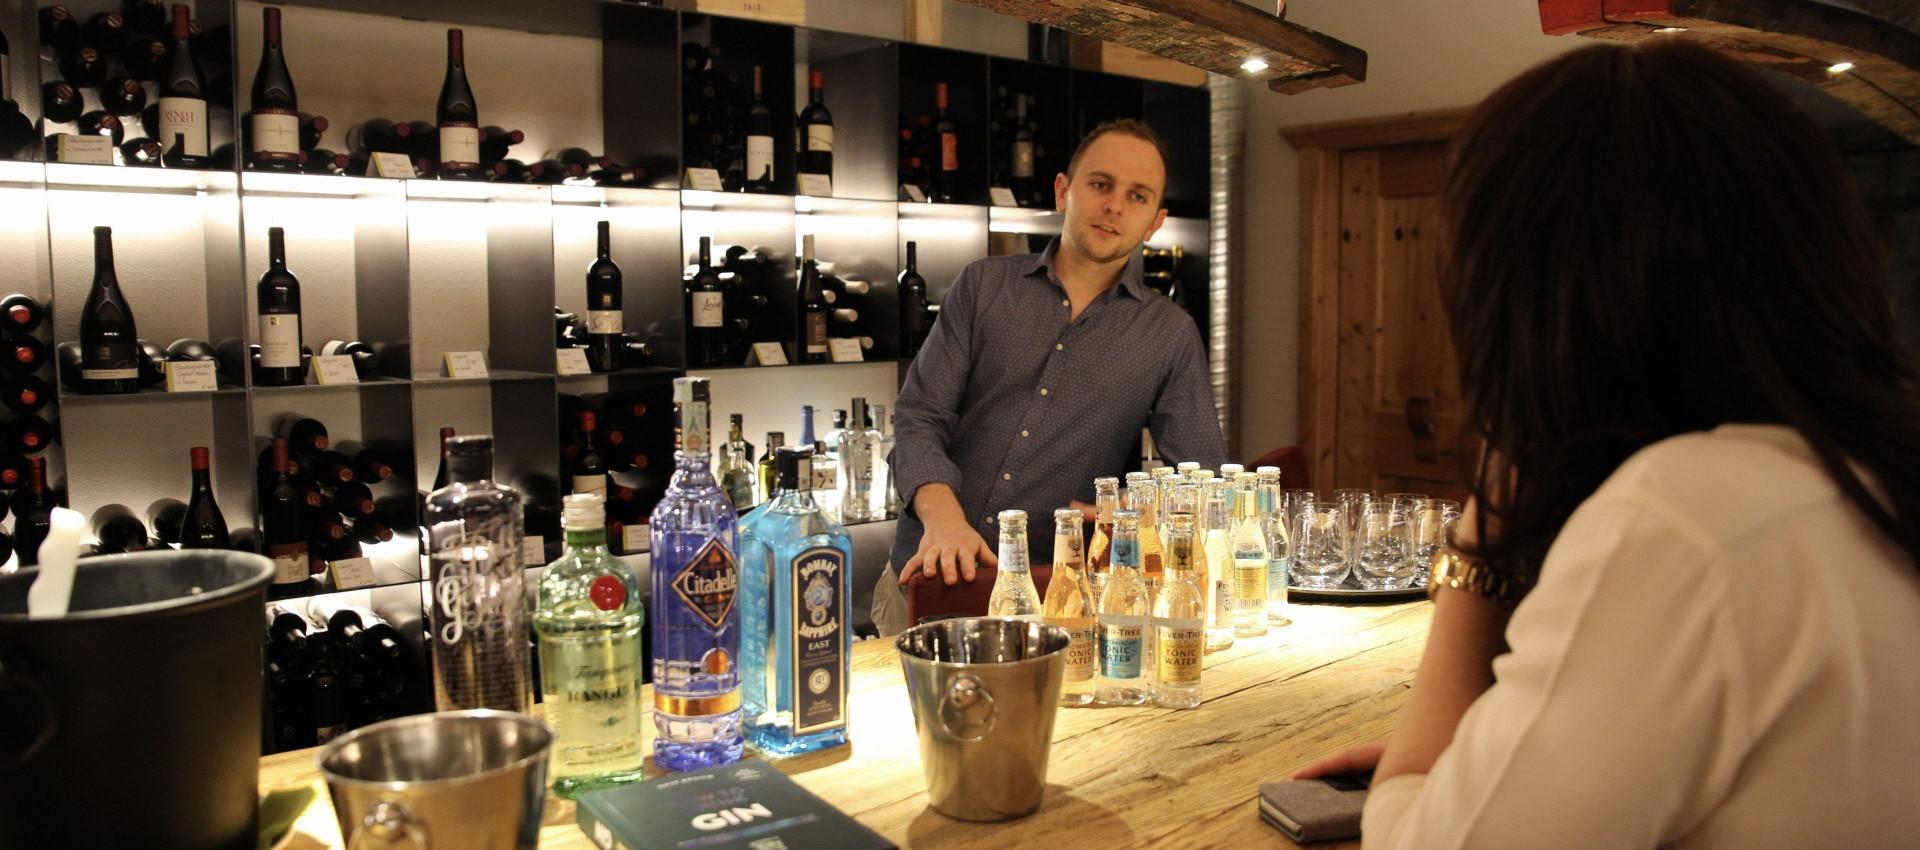 Gin Tasting Hotel 4 Sterne bei Meran, Gin & Kulinarik